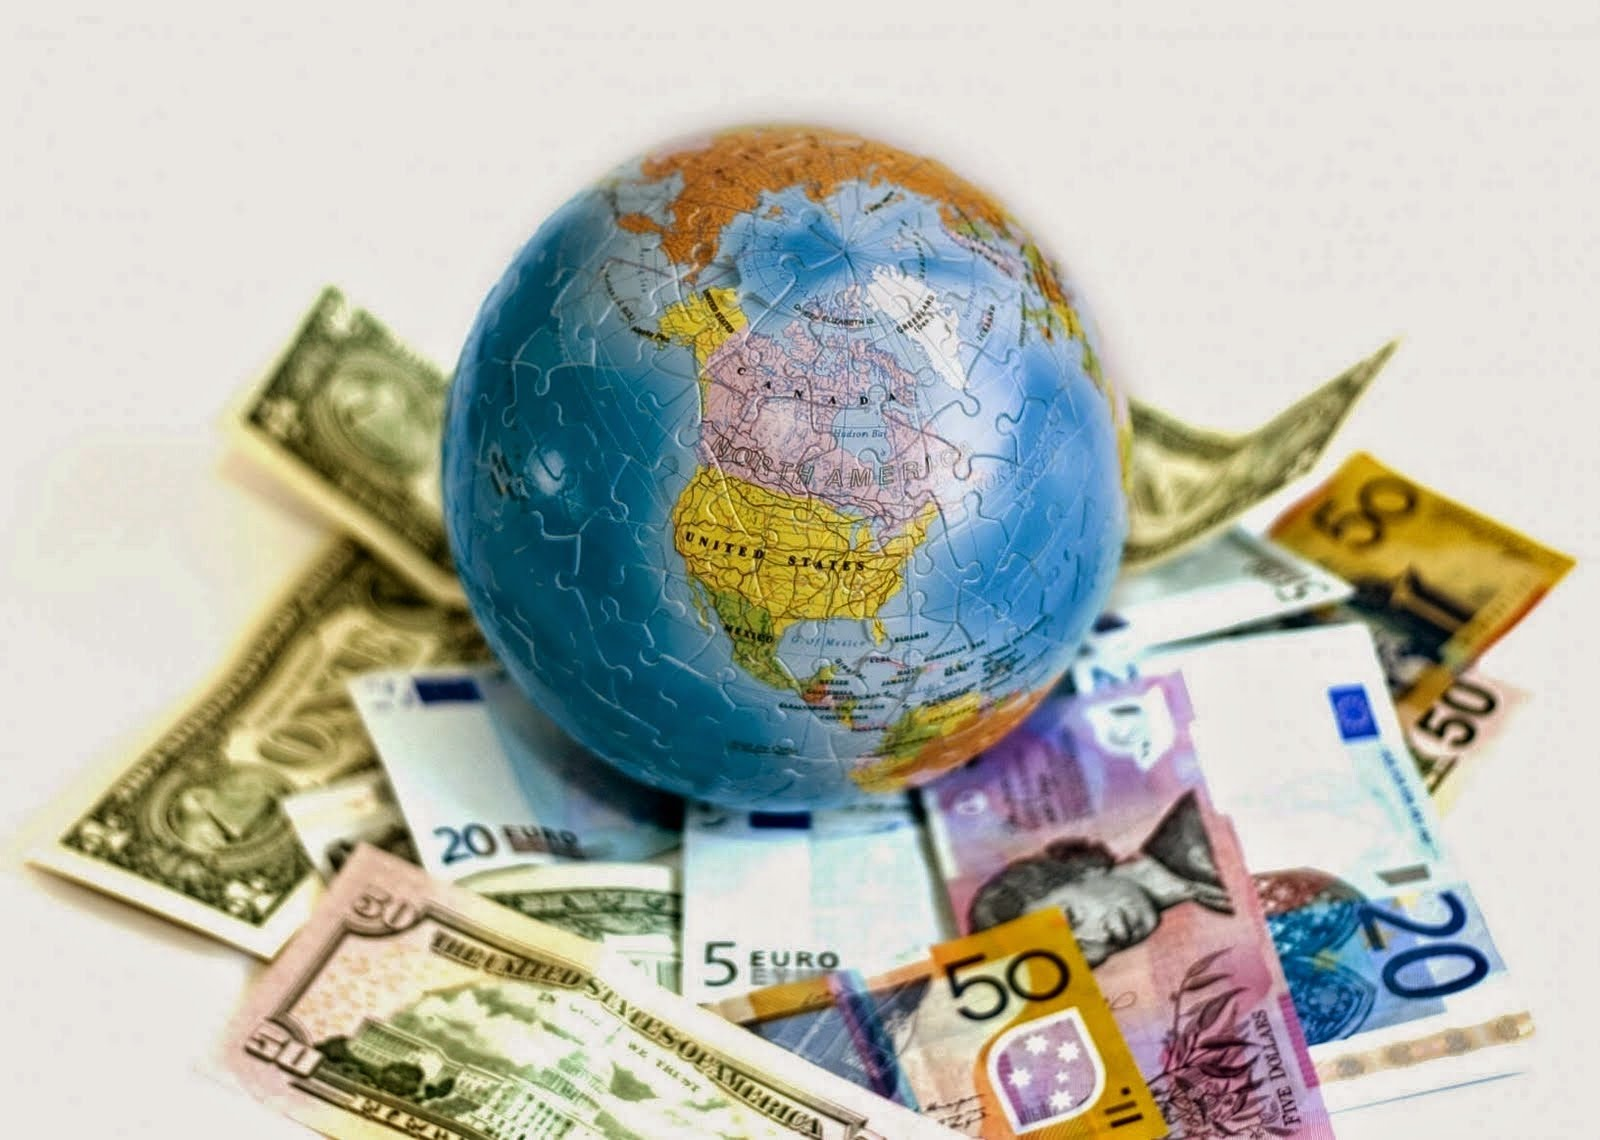 Switzerland is the biggest investor in Albania